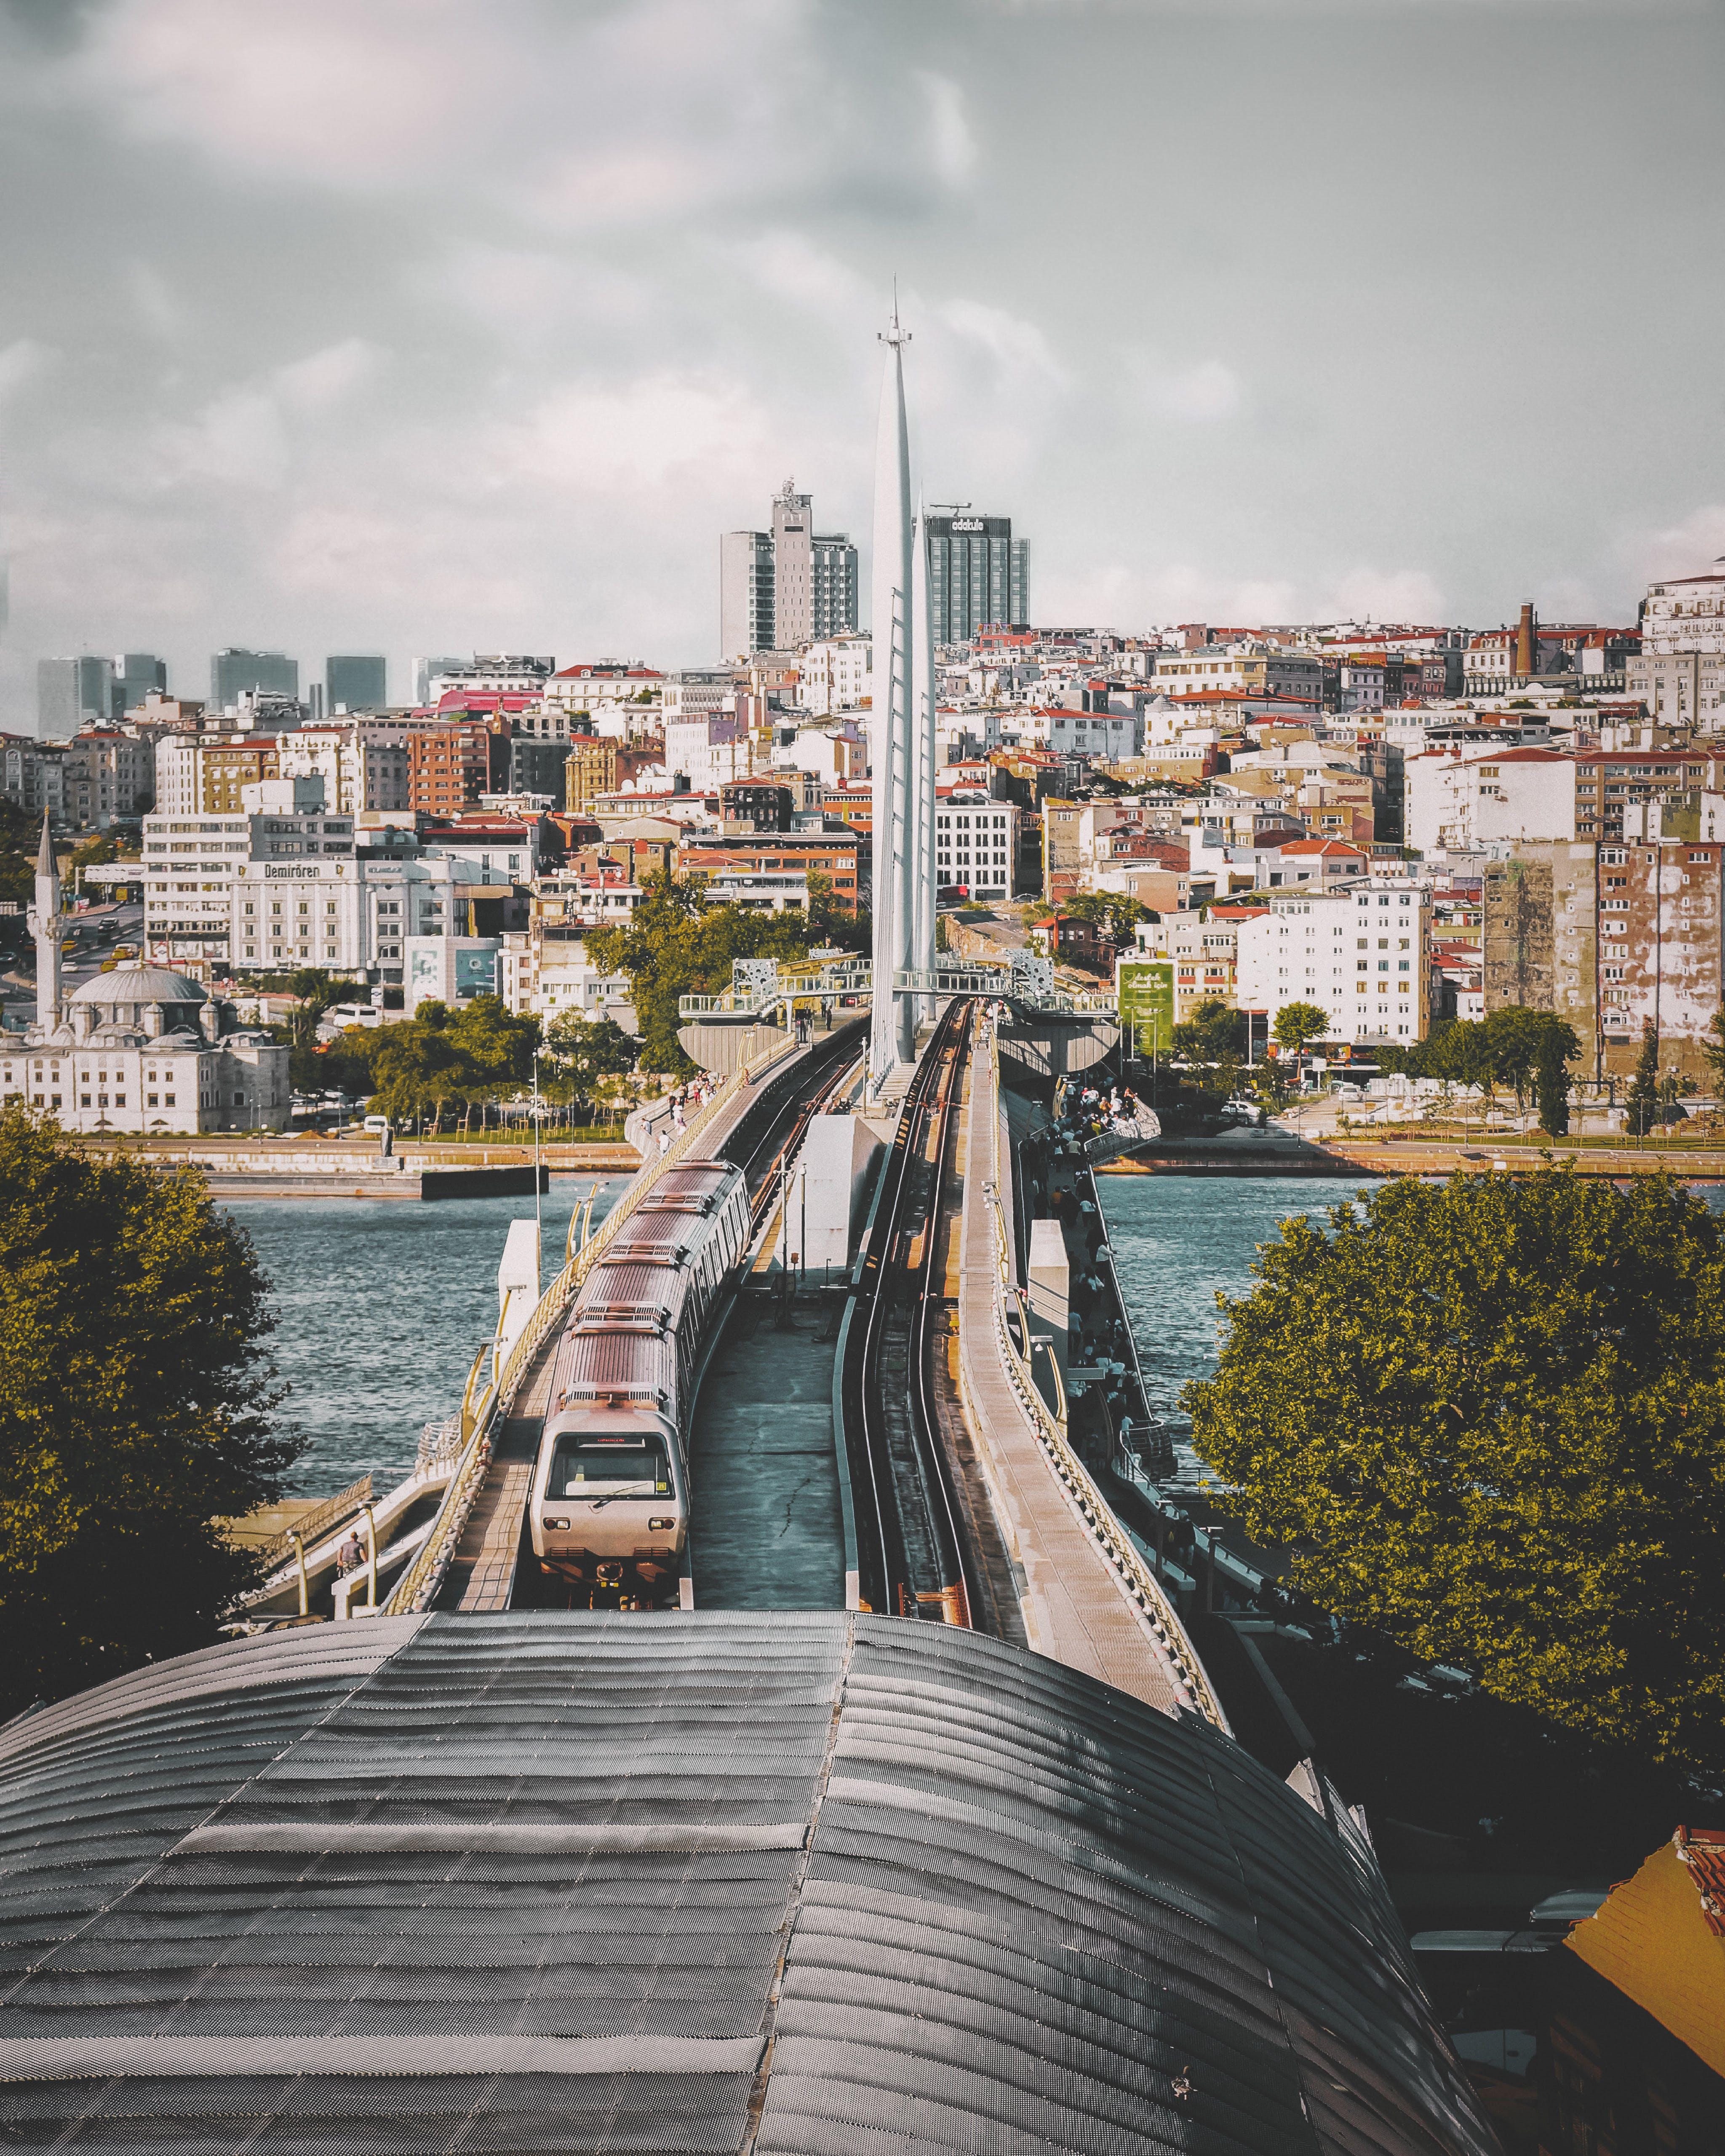 Train Bridge to City